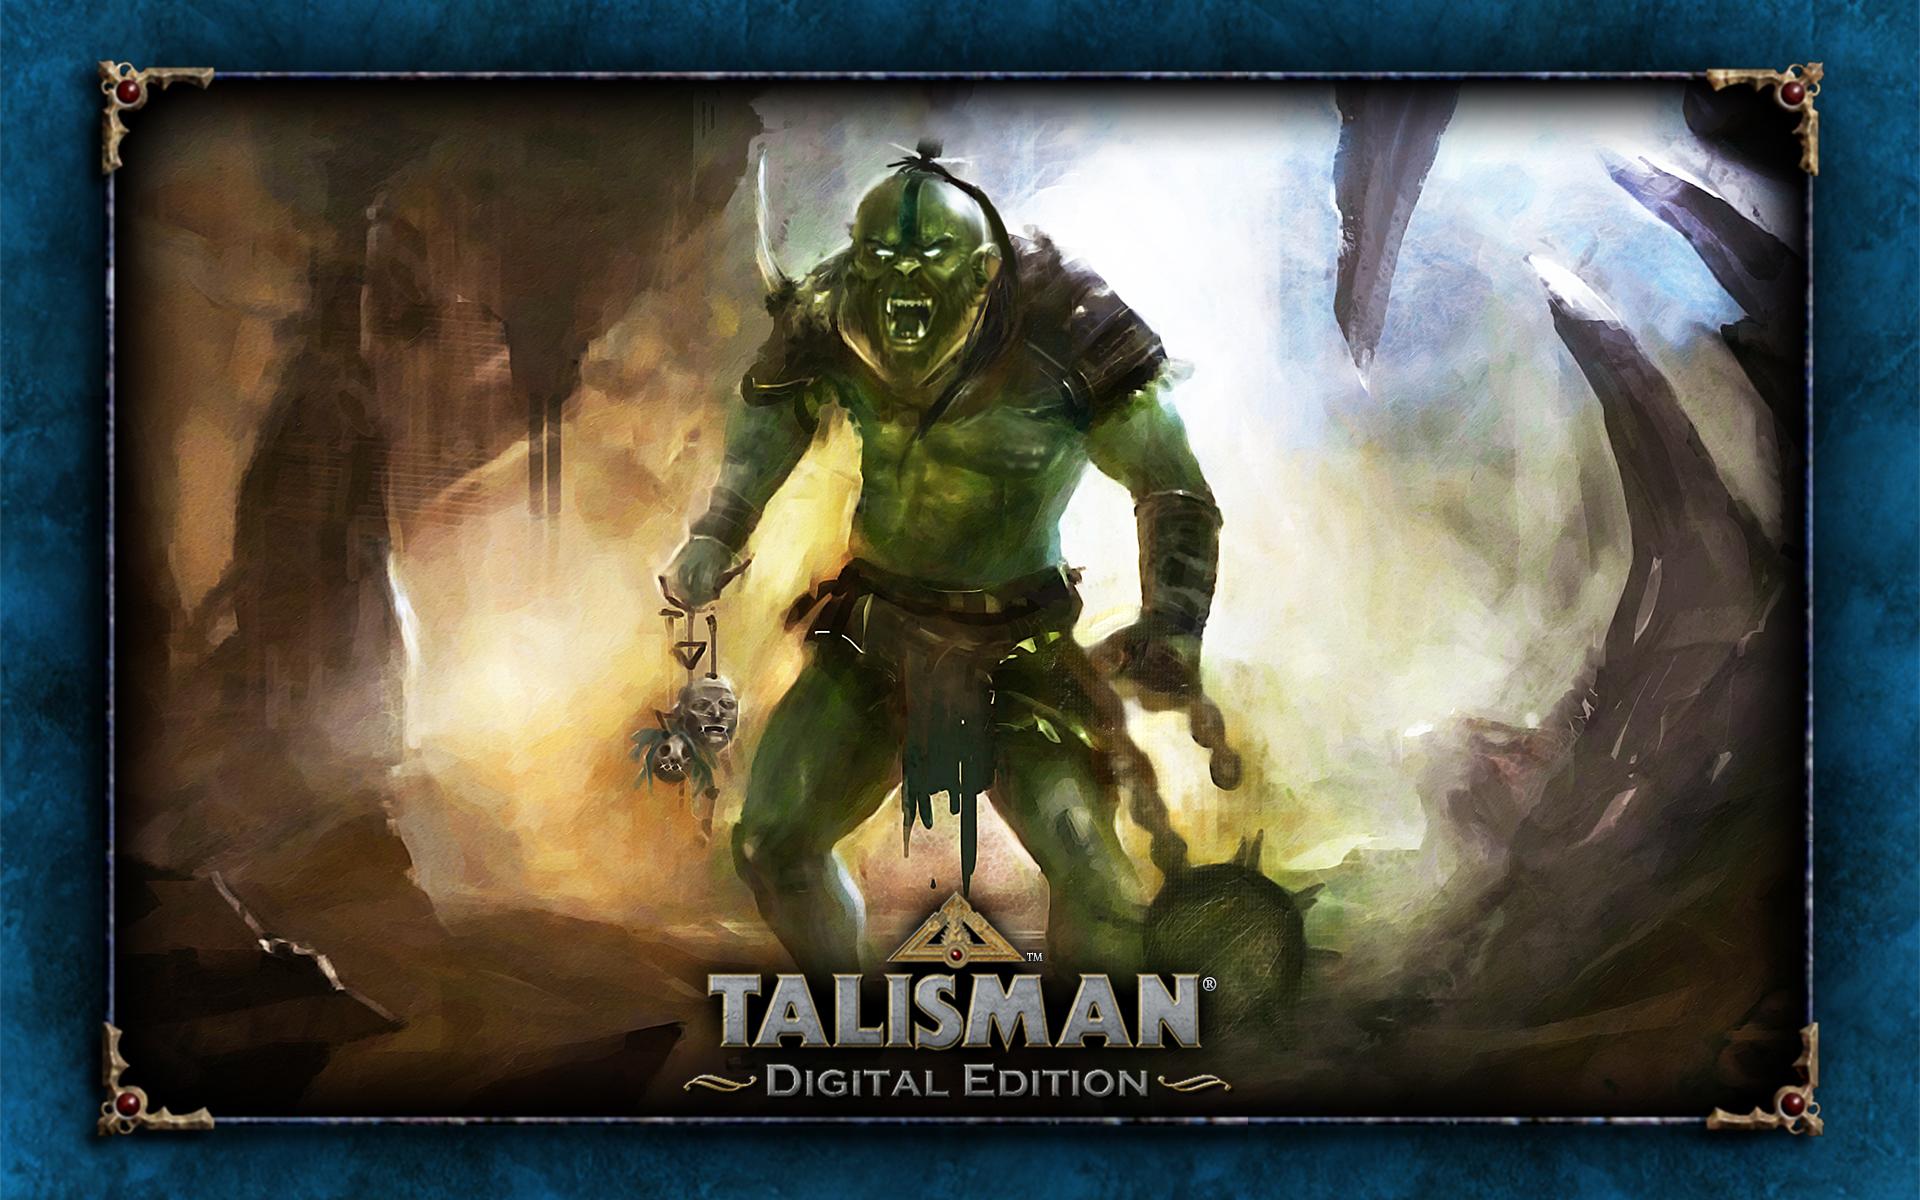 Talisman avenger legacy the beast of IRON MAIDEN's